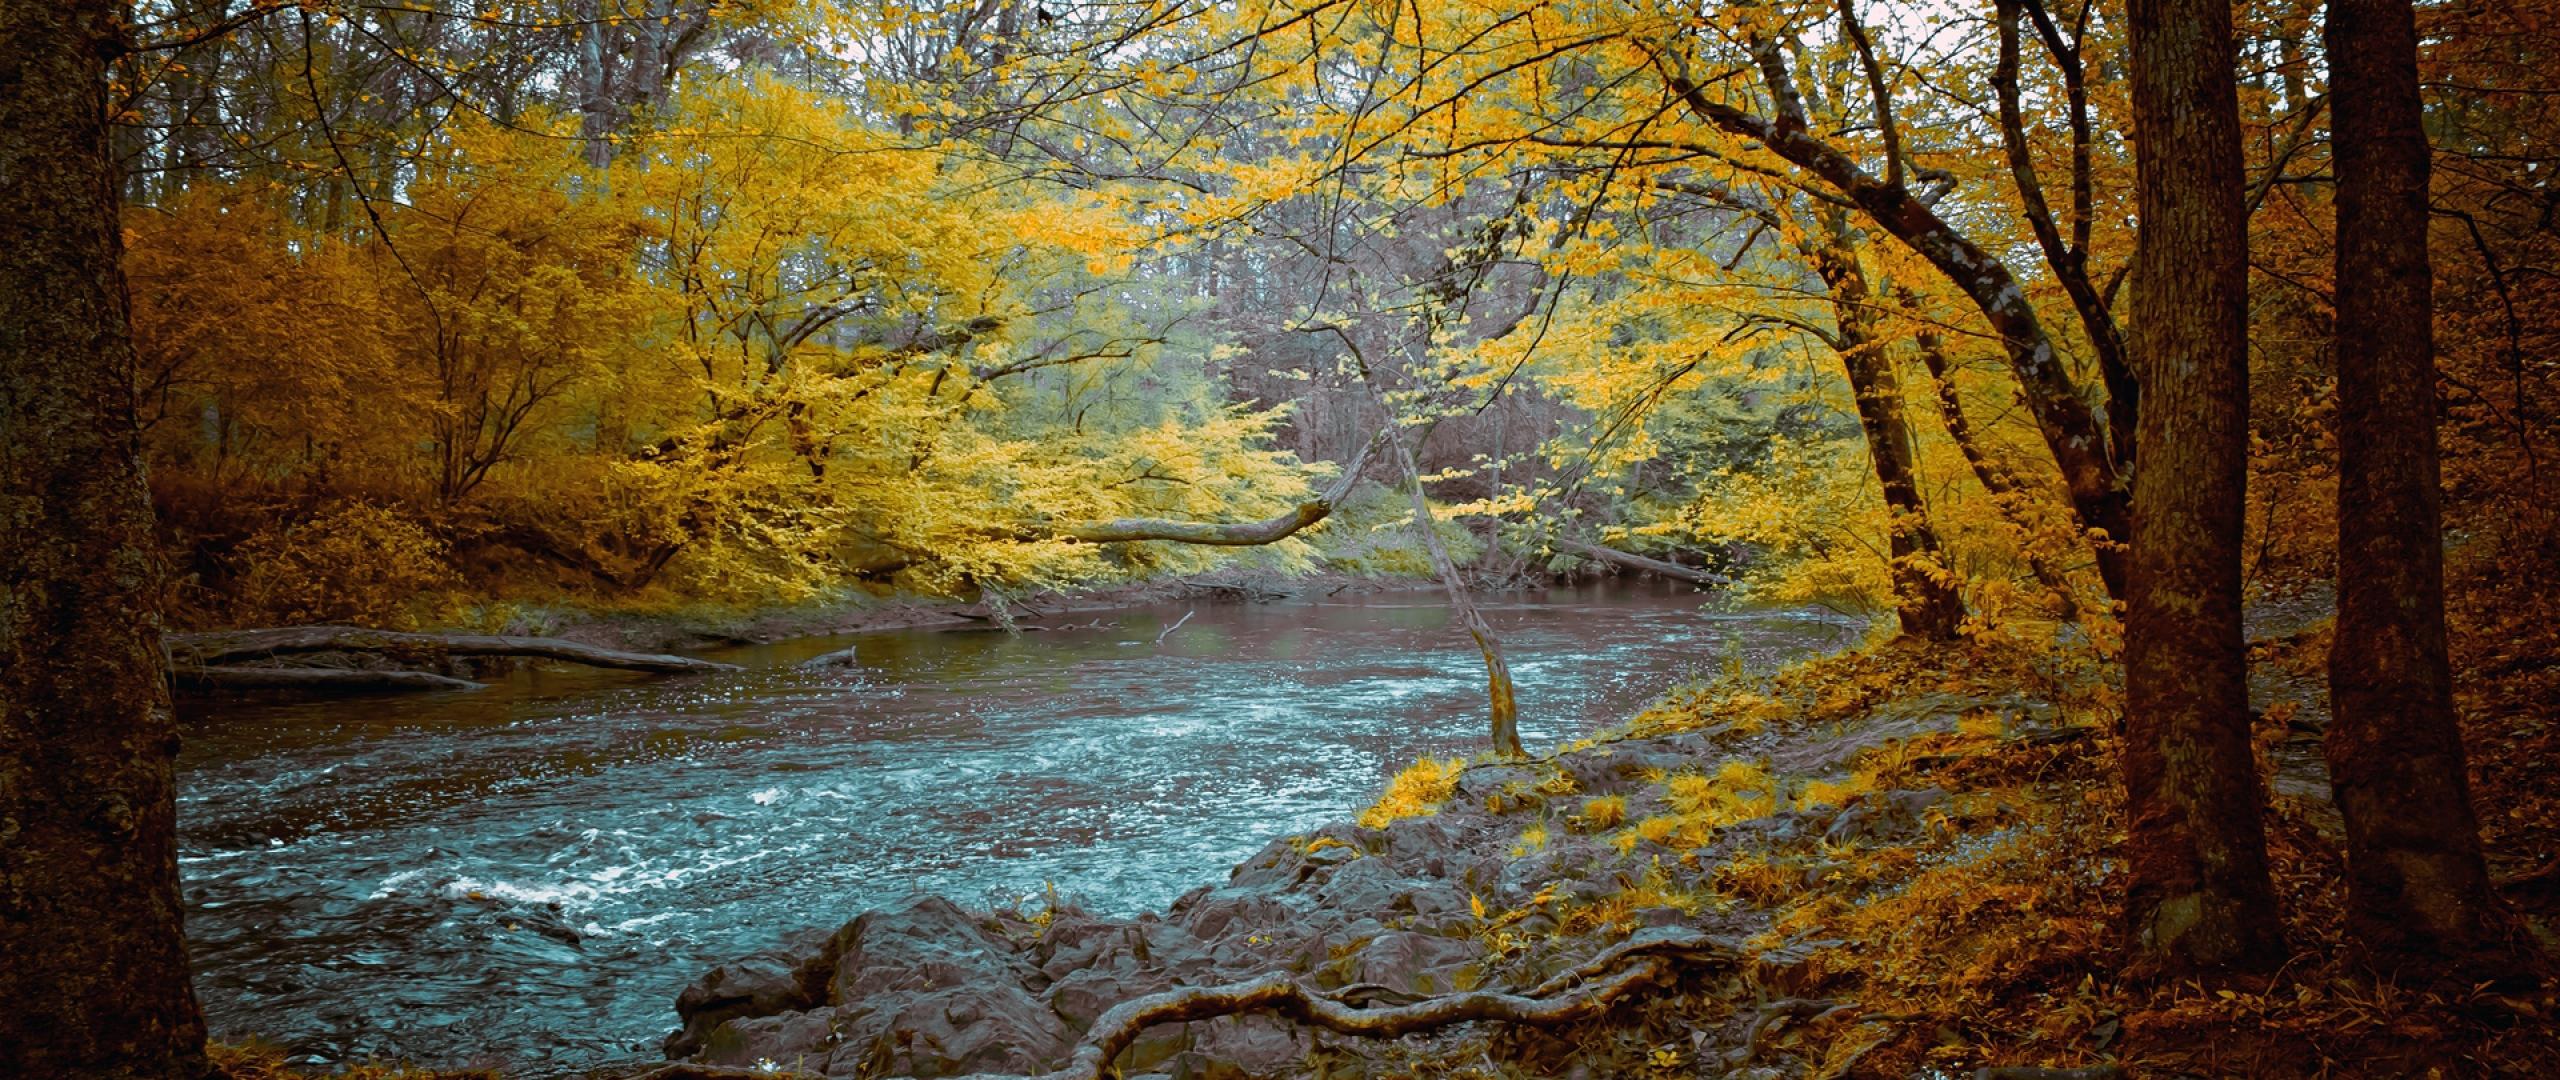 2560x1080 Wallpaper mountain river stones wood dark for fall 2560x1080